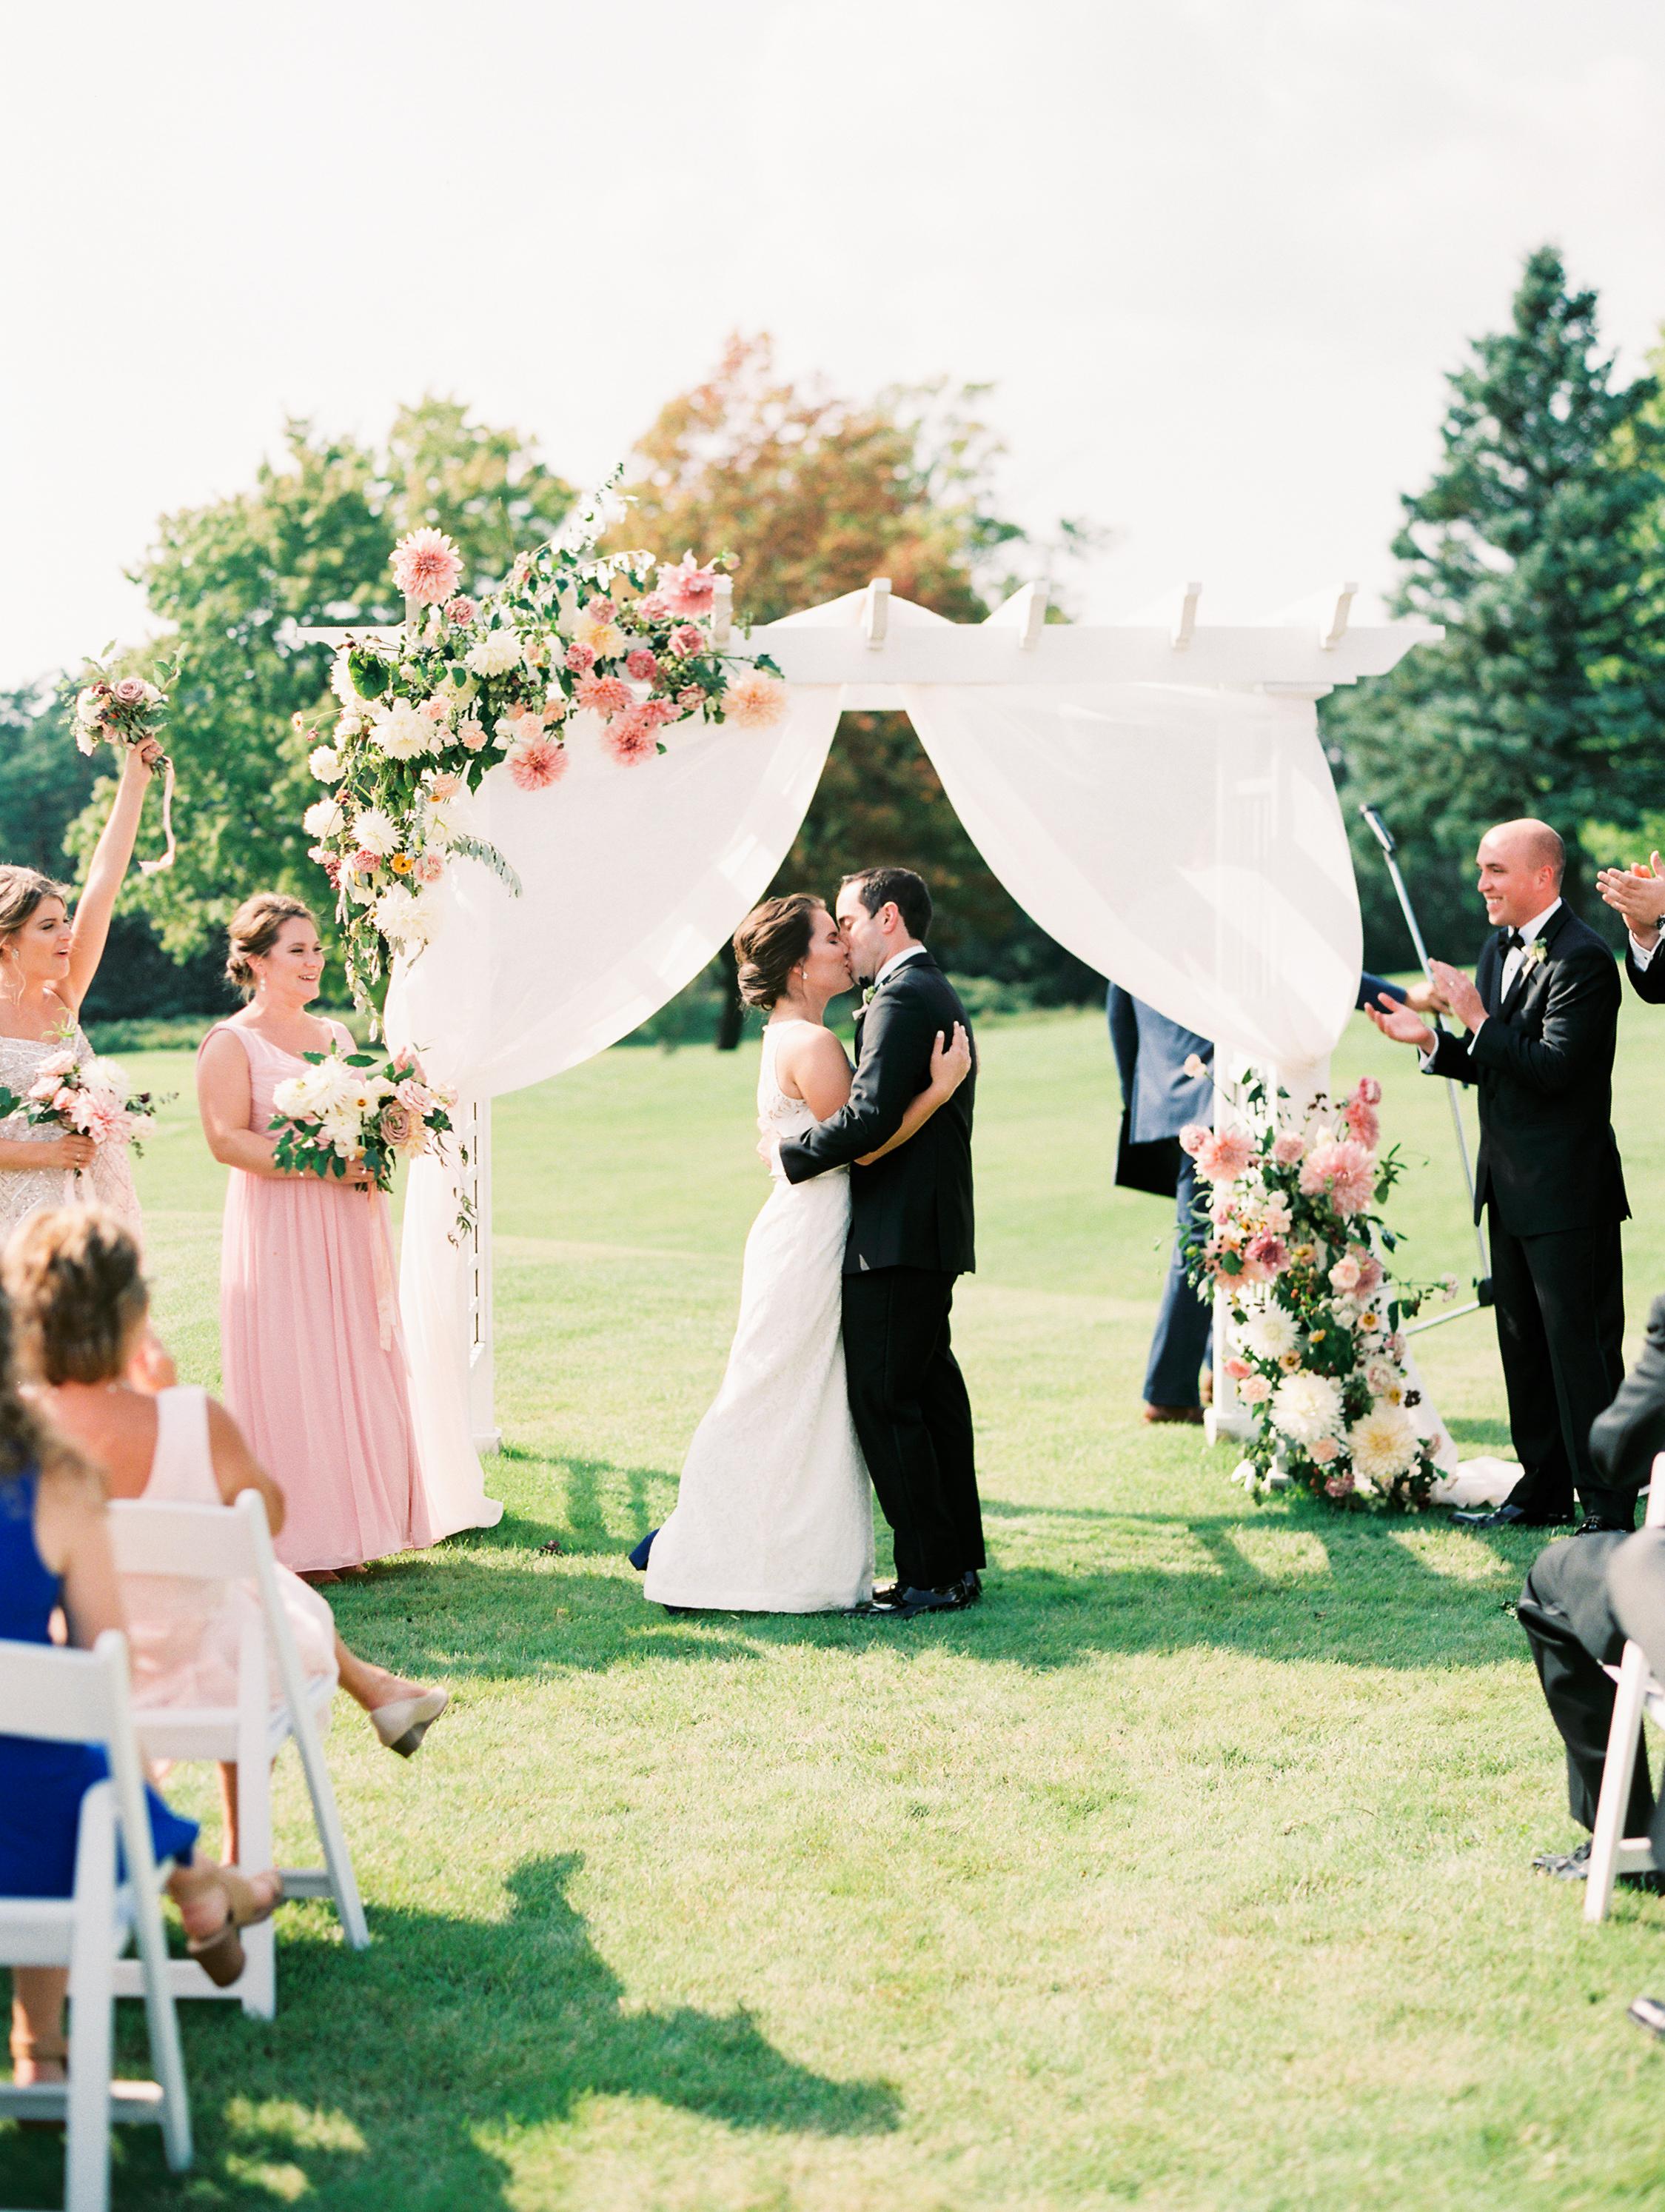 Zoller+Wedding+Ceremonyf-5.jpg